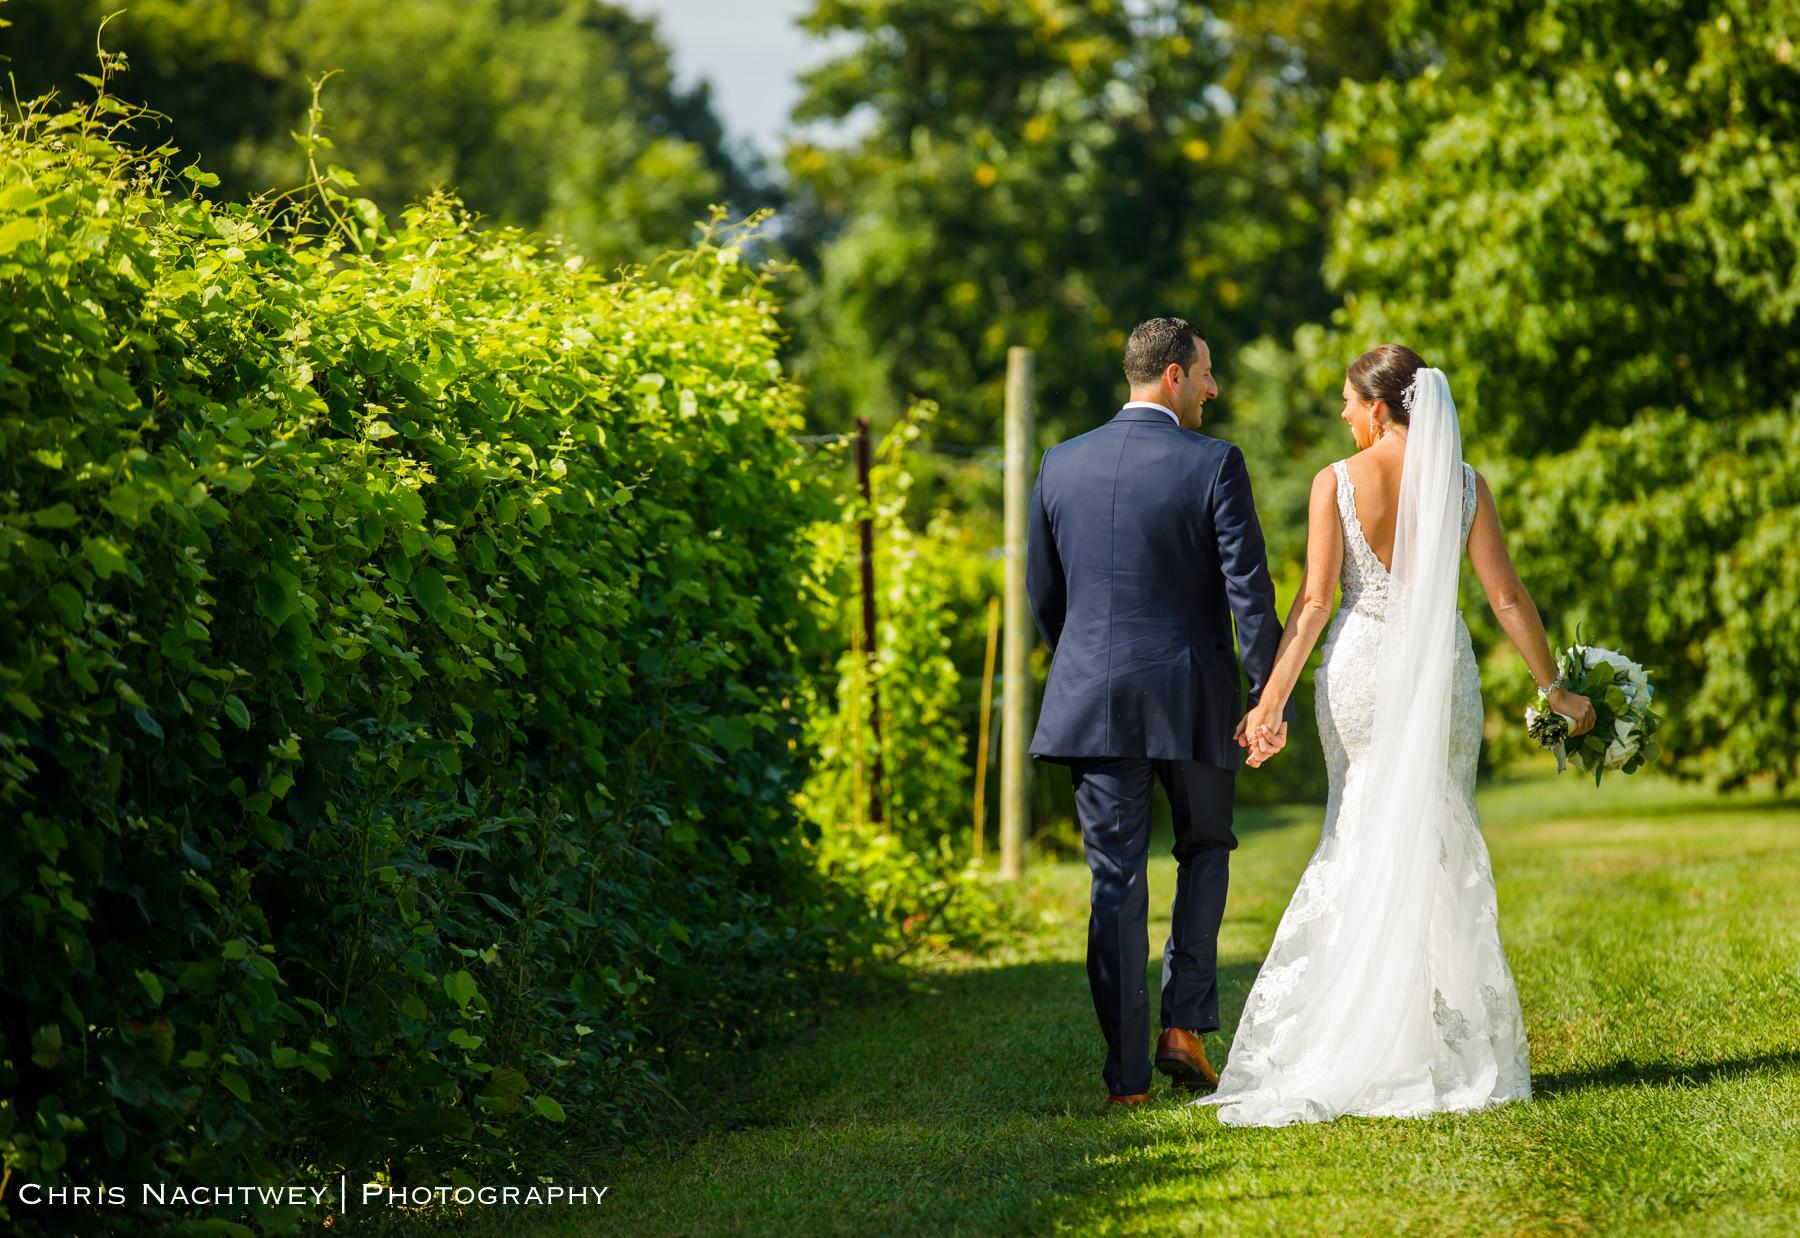 wedding-lake-of-isles-photos-chris-nachtwey-photography-2019-17.jpg